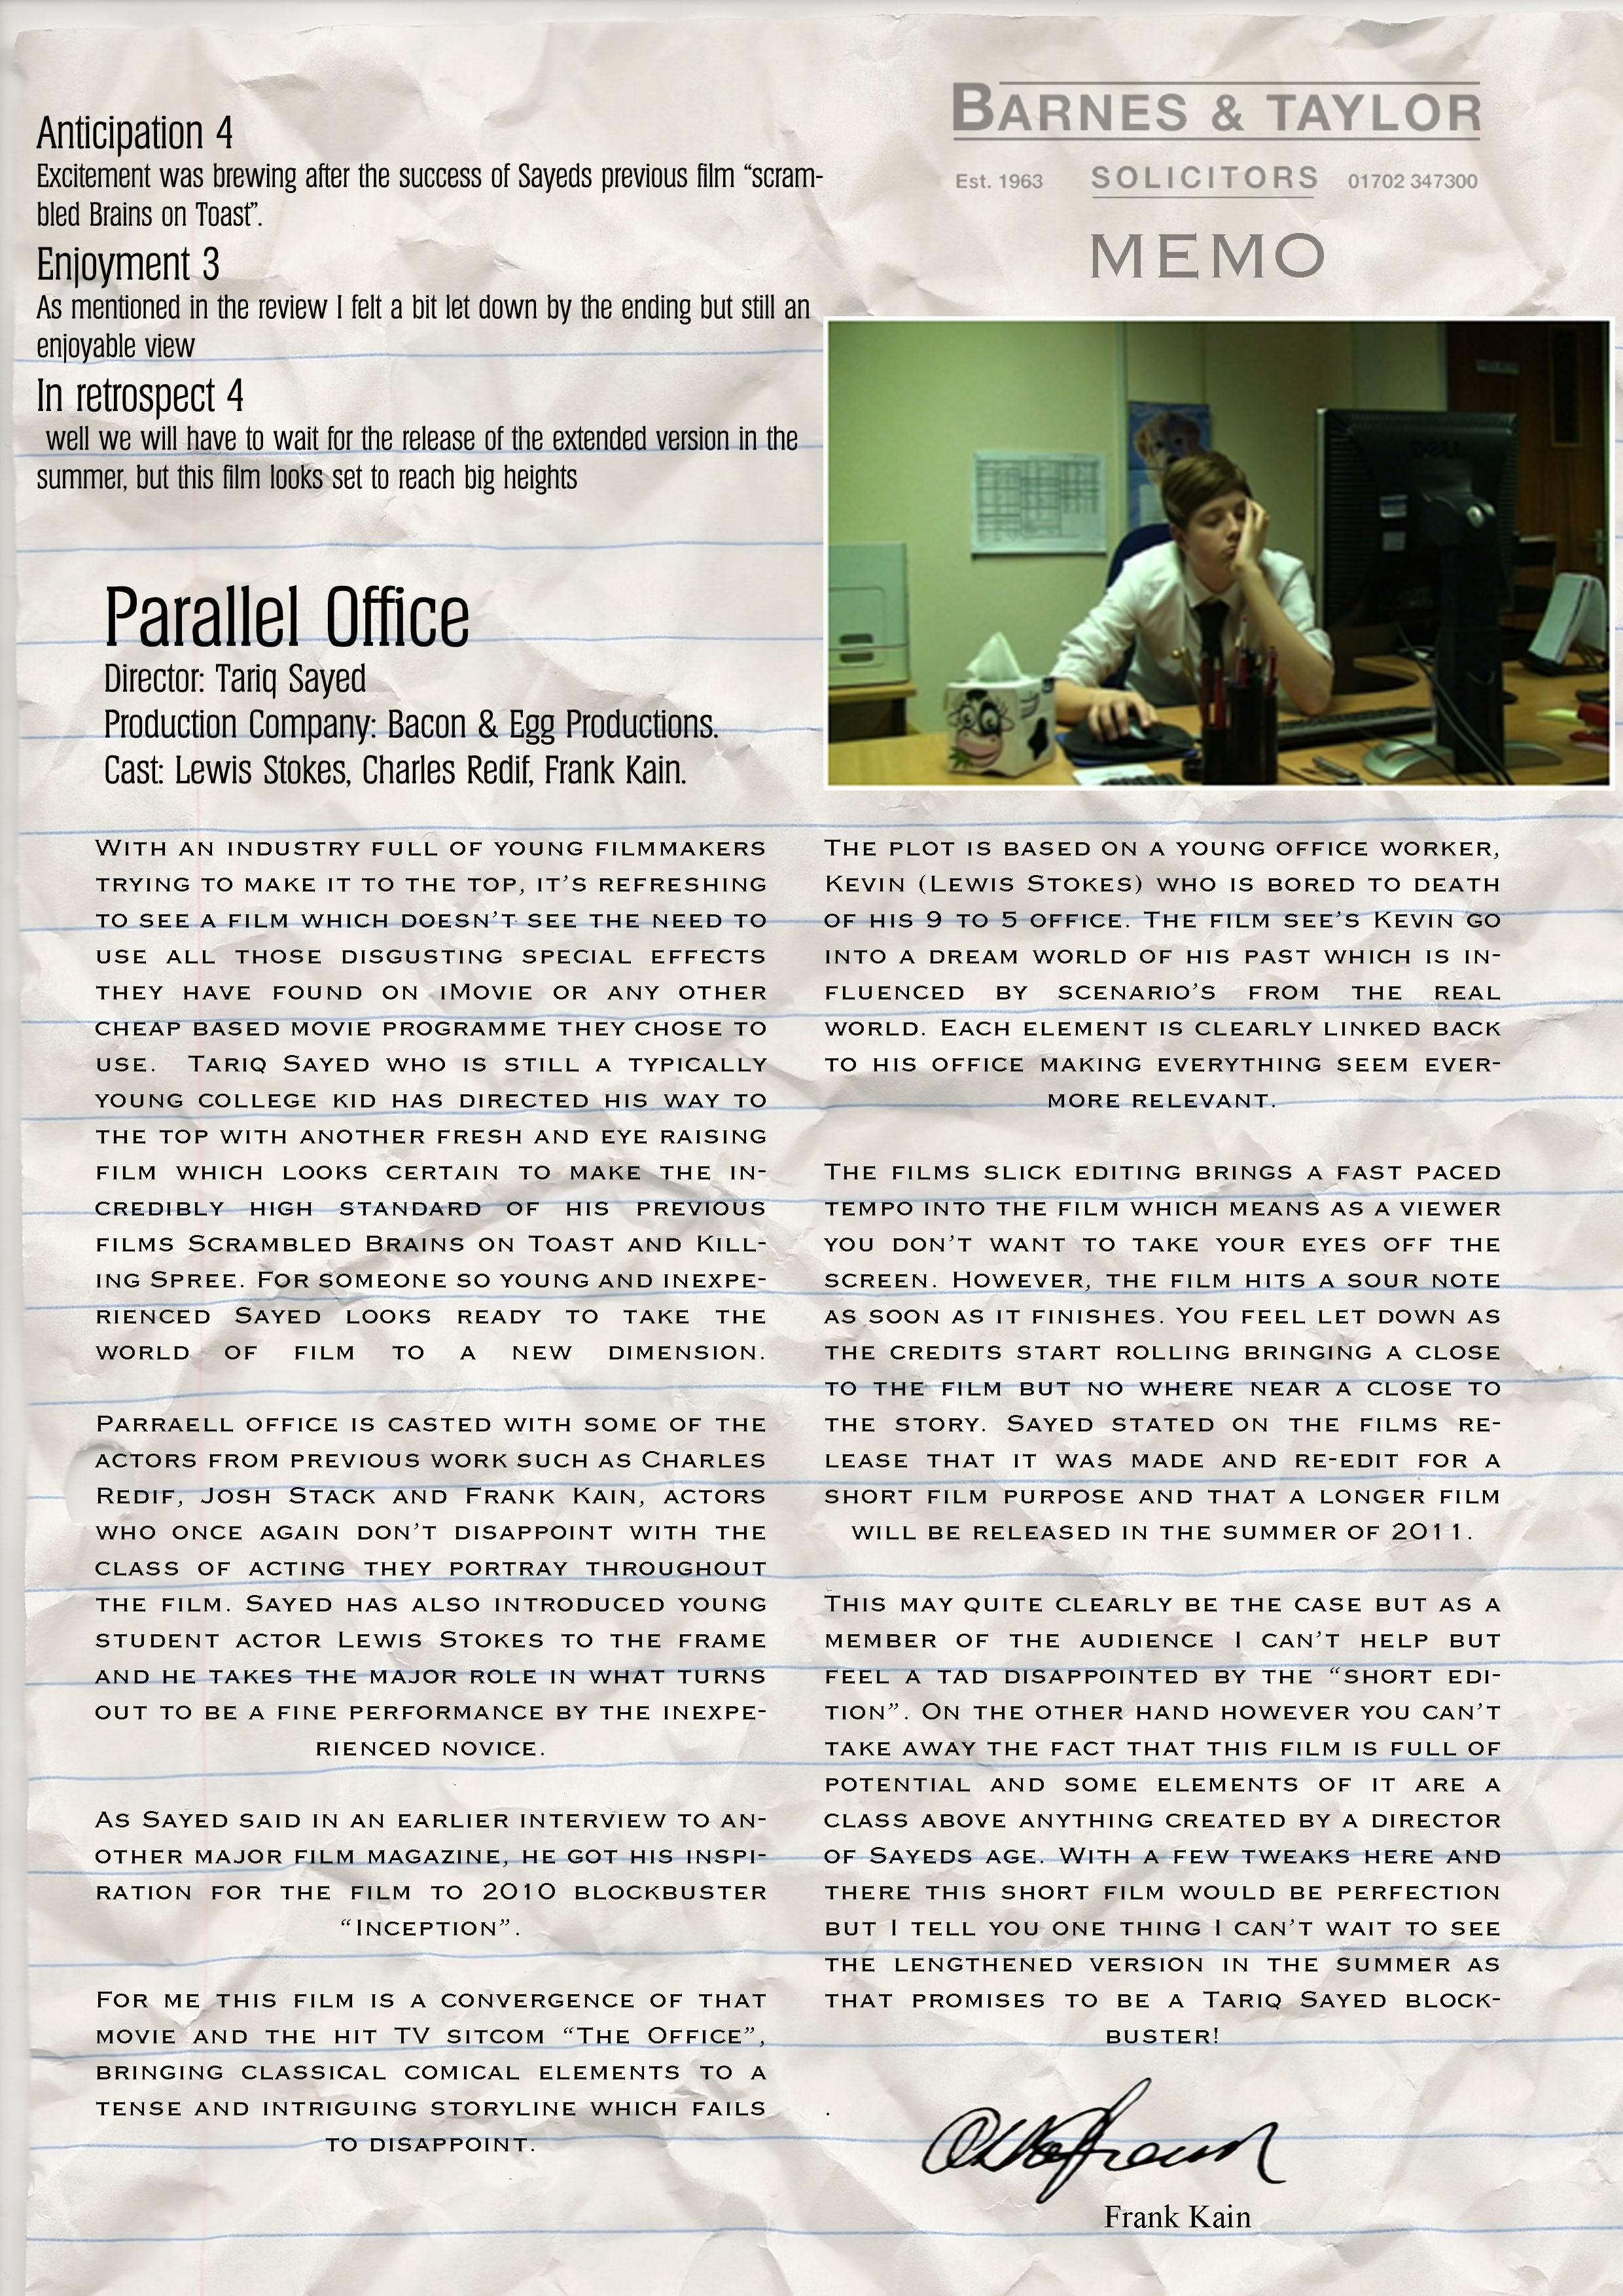 017 Rush Essay Review Film Best My Reviews Full